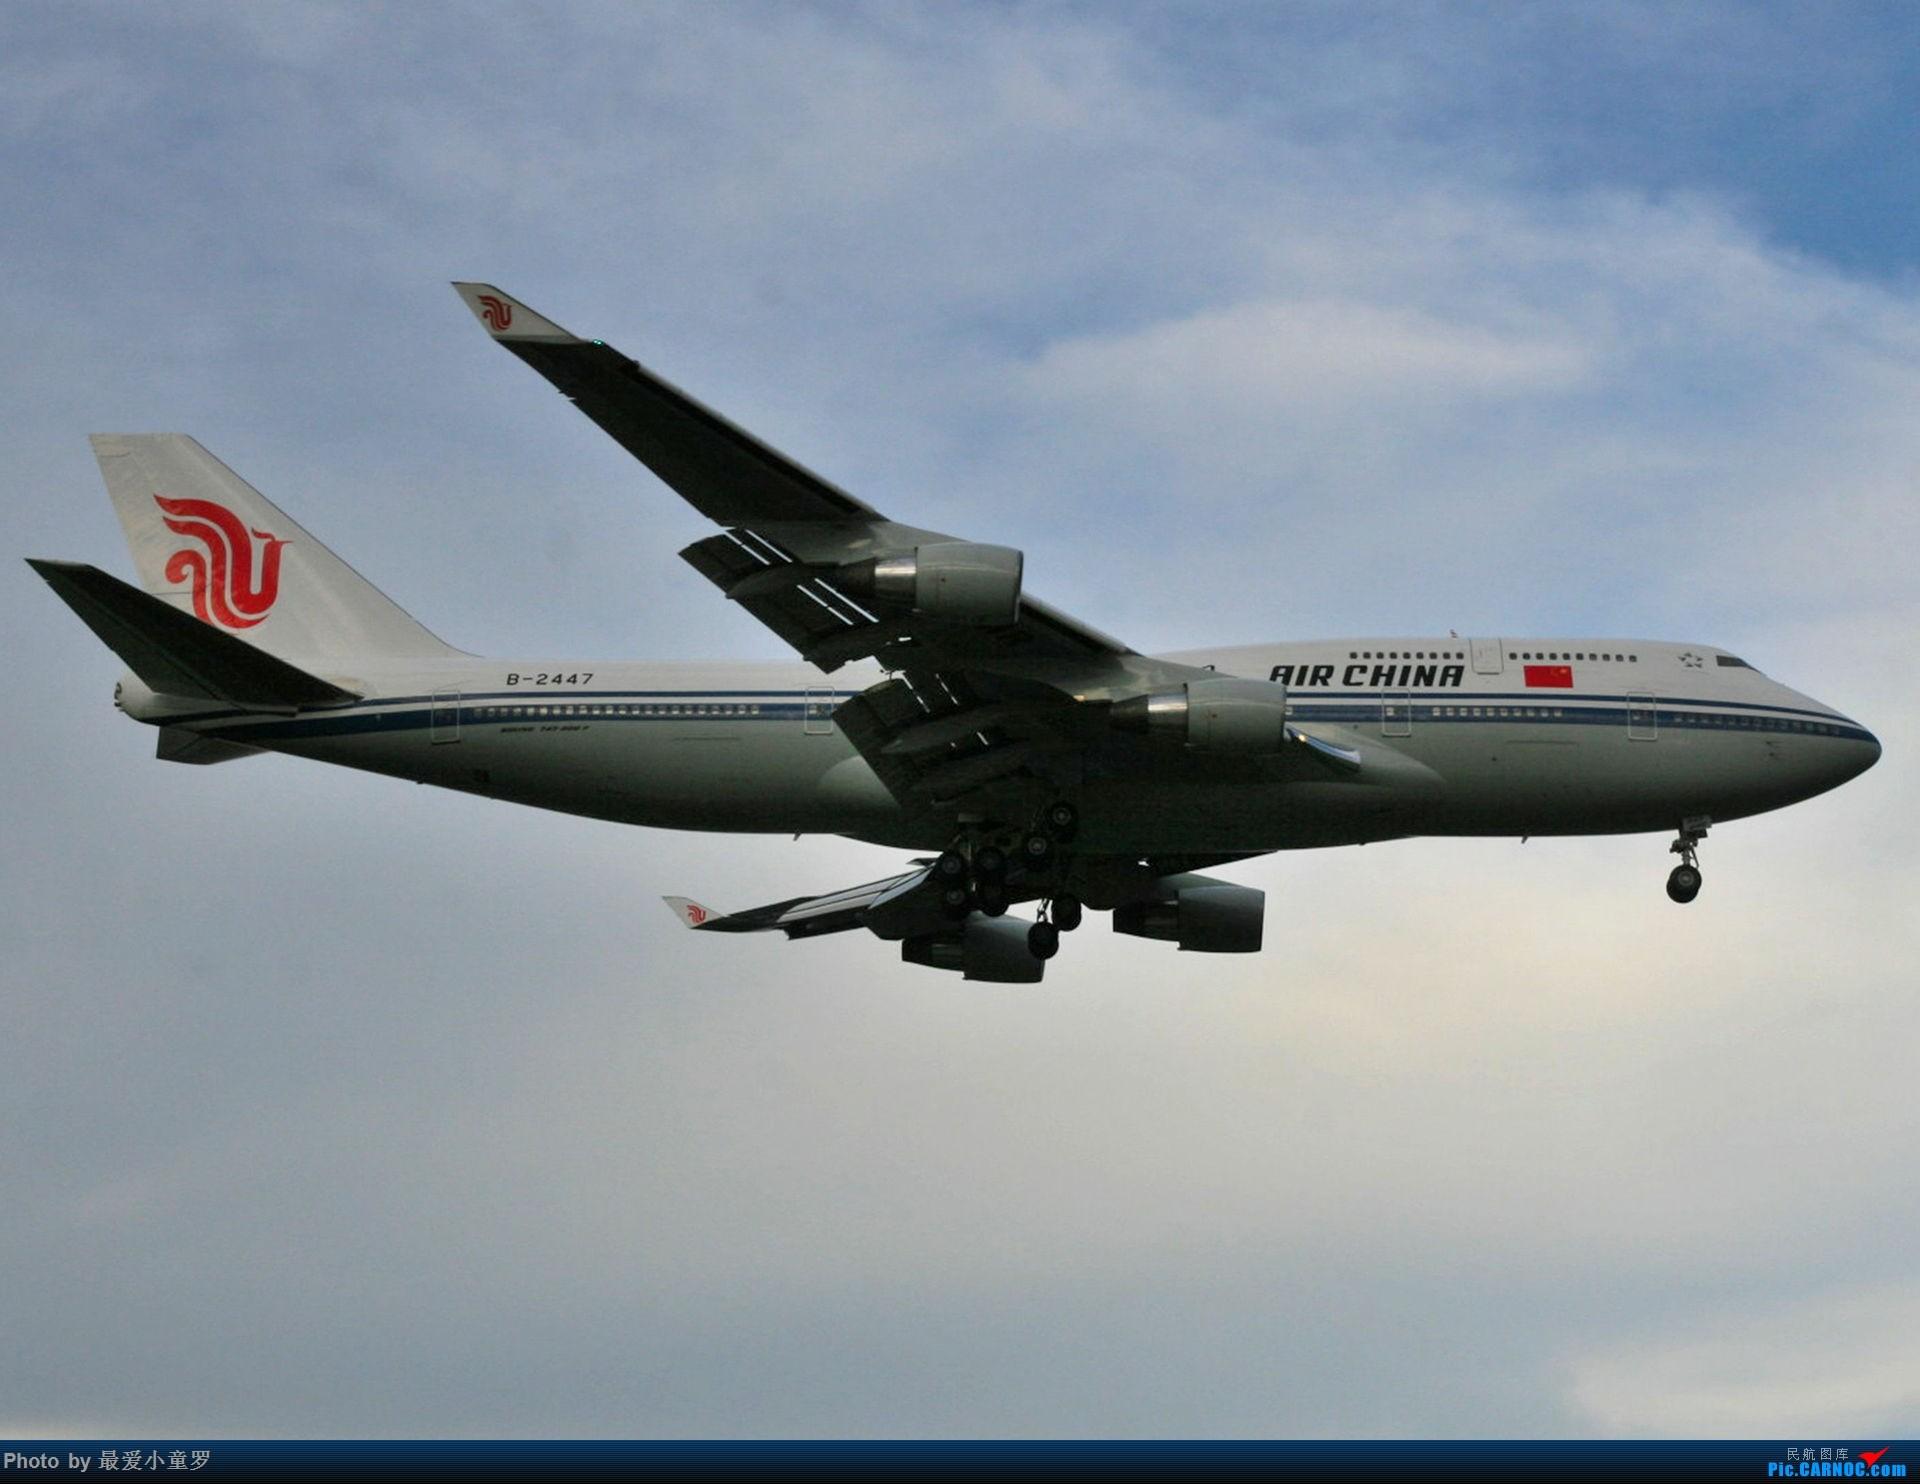 Re:[原创]旧的不去,新的不来——致2014远去的背影! BOEING 747-400 B-2447 中国广州白云国际机场